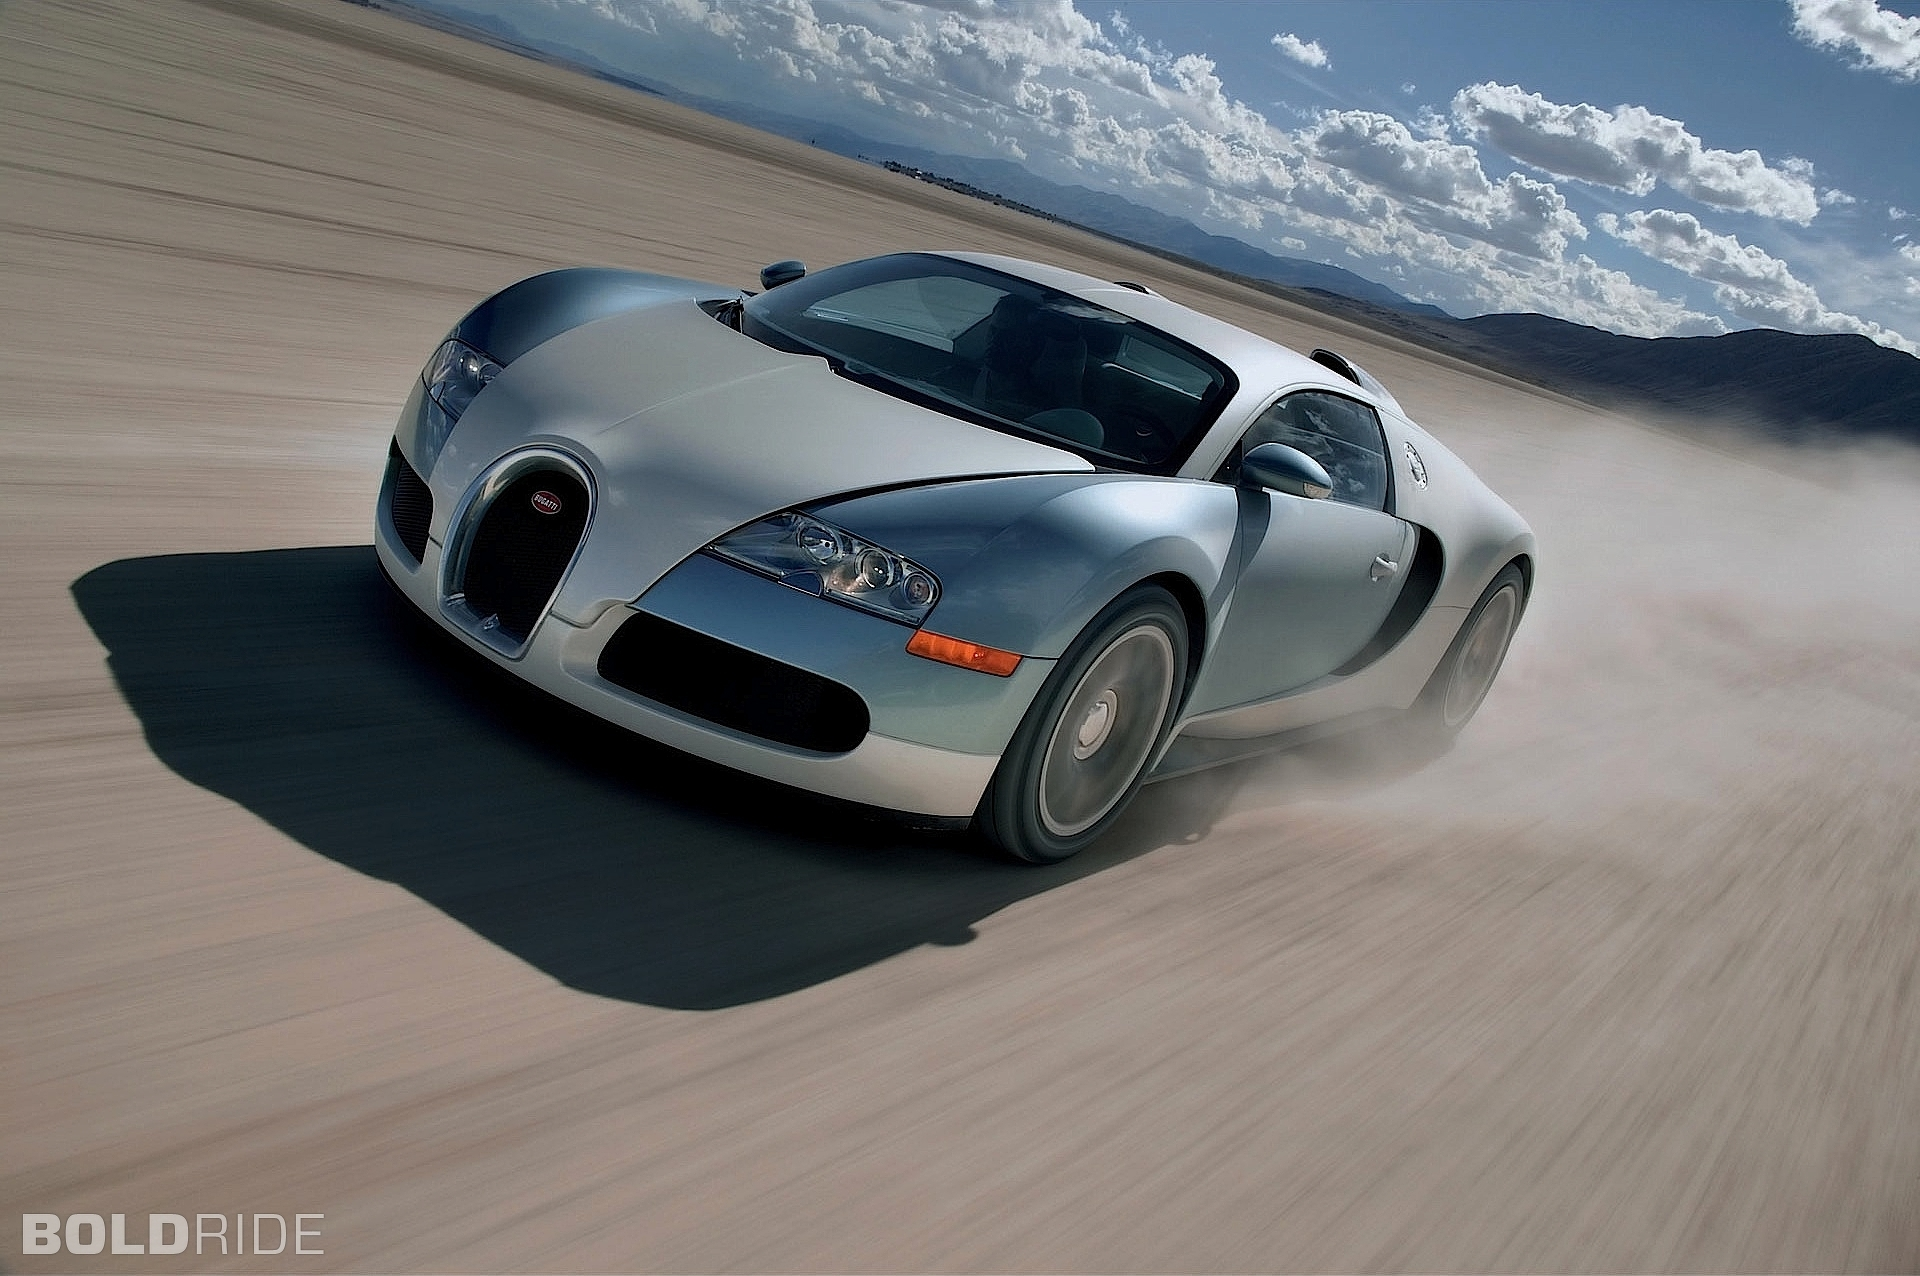 Https www motor1 com news 79535 bugatti veyron bugatti general supercar coupe sports car france 200mph 2000 2009 0 60 in under 3 seconds